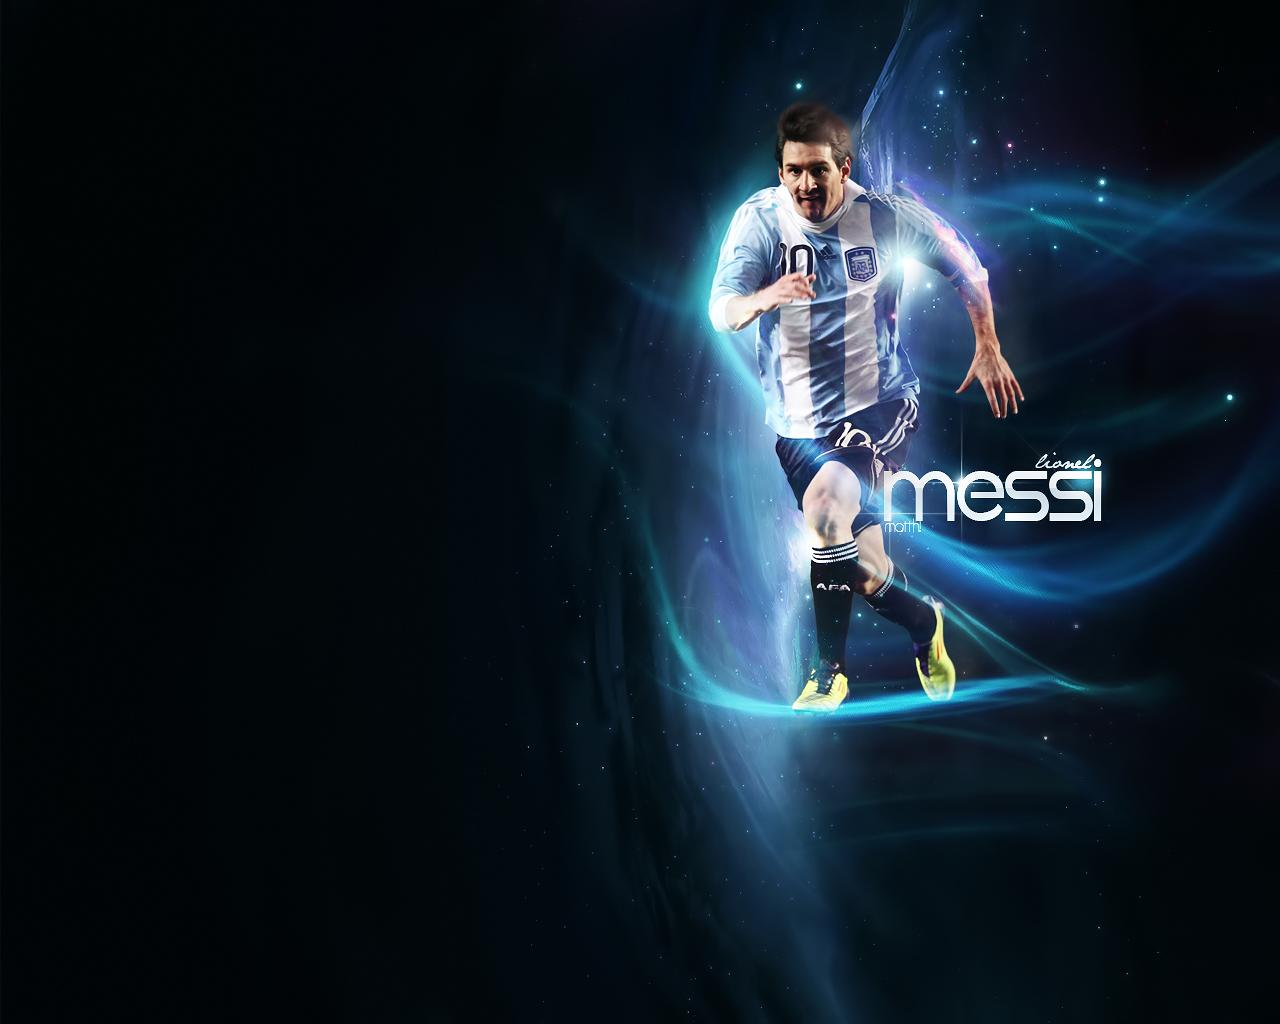 Messi Desktop Background Pixelstalk Lionel Messi Wallpaper Hd